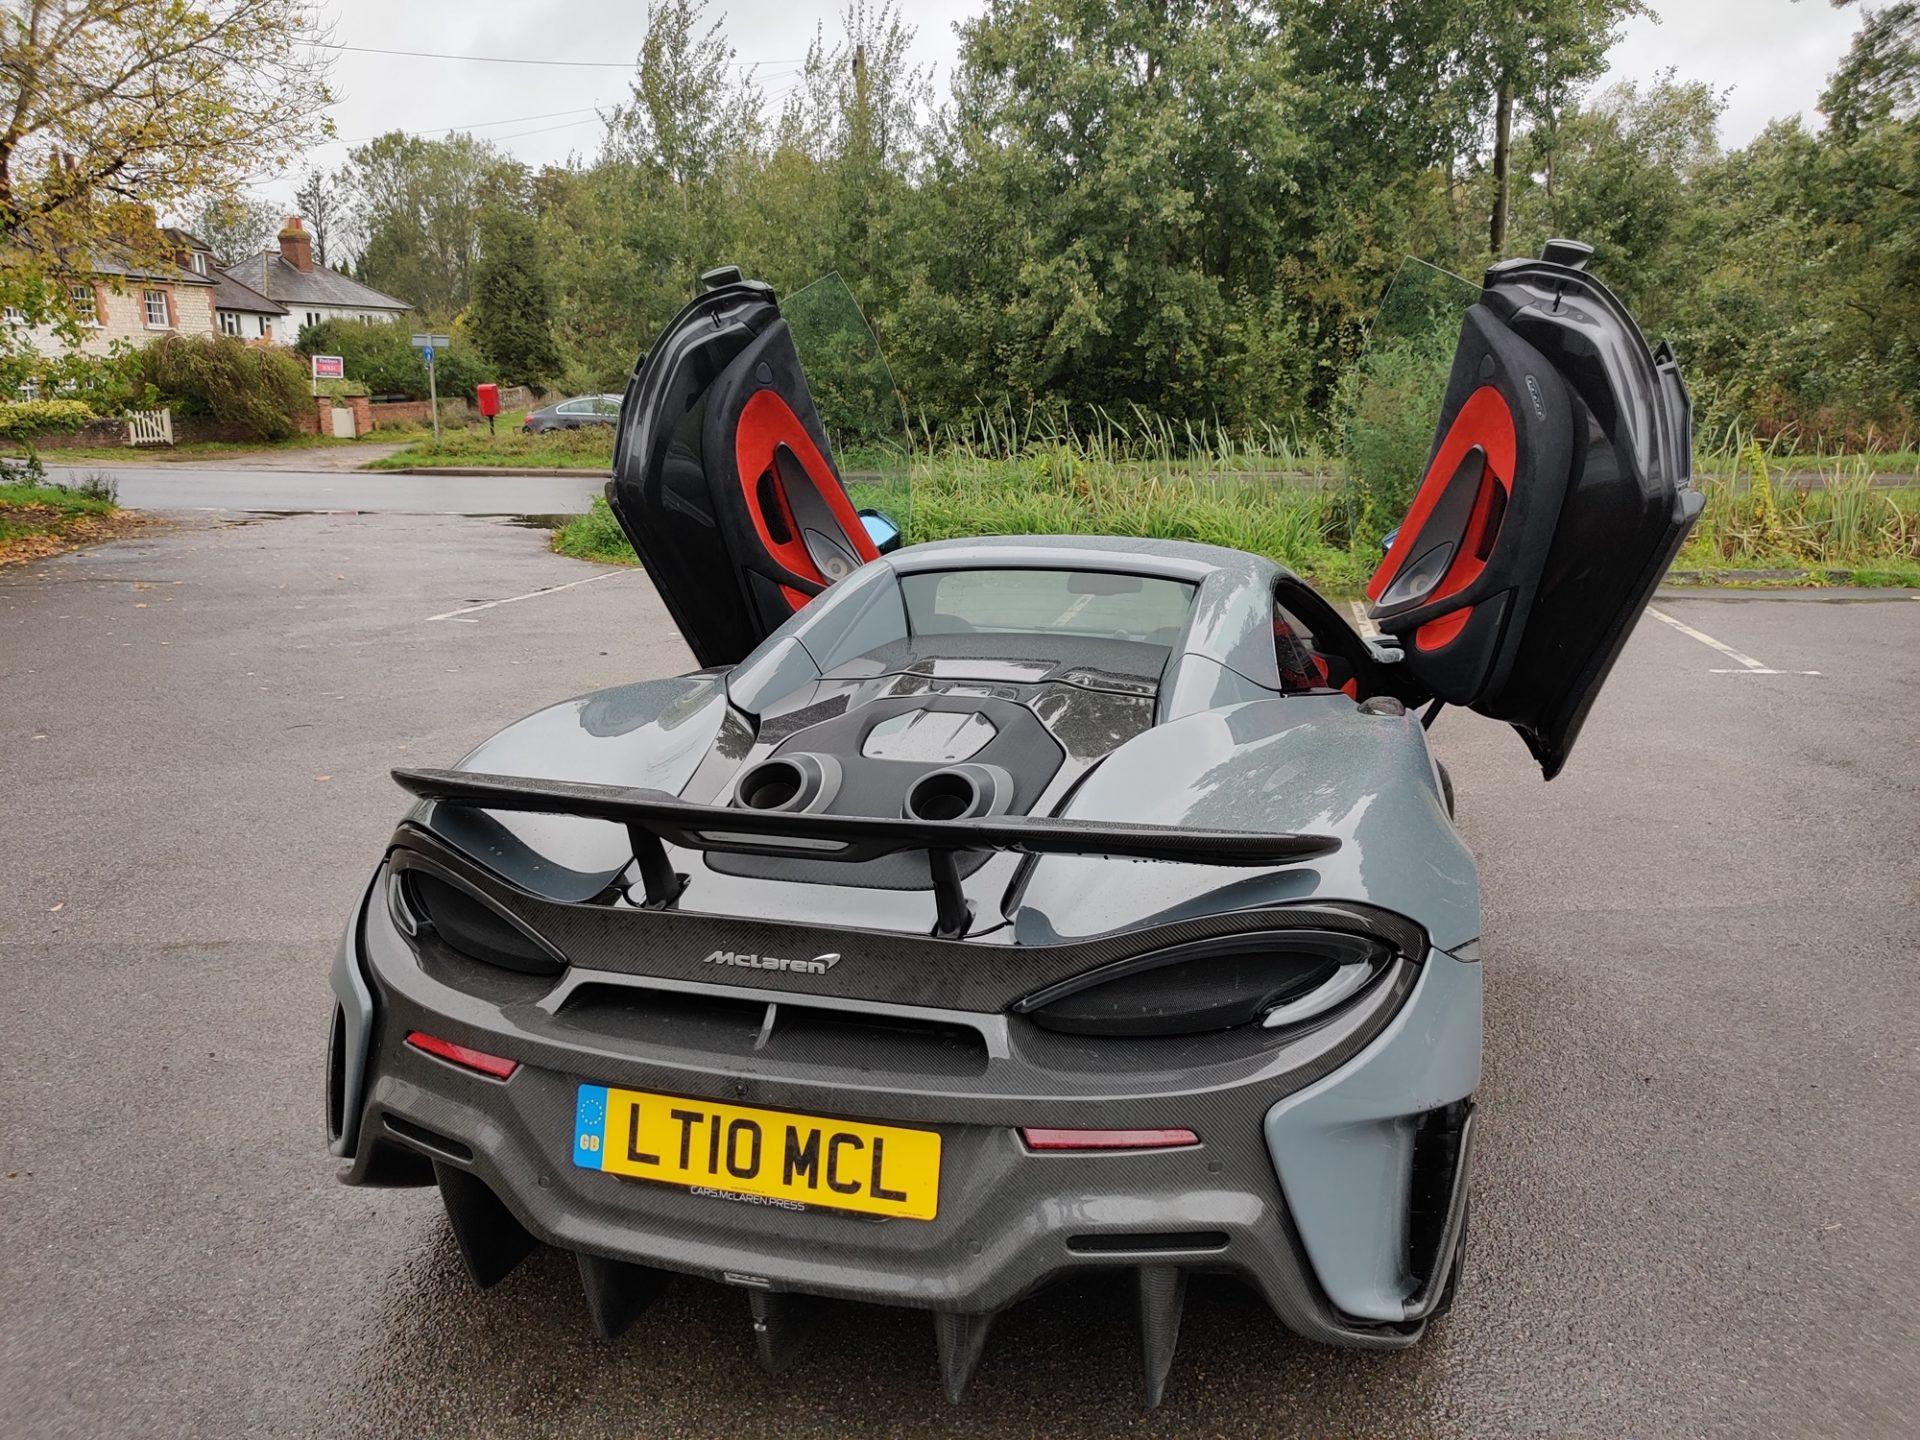 McLaren Edition